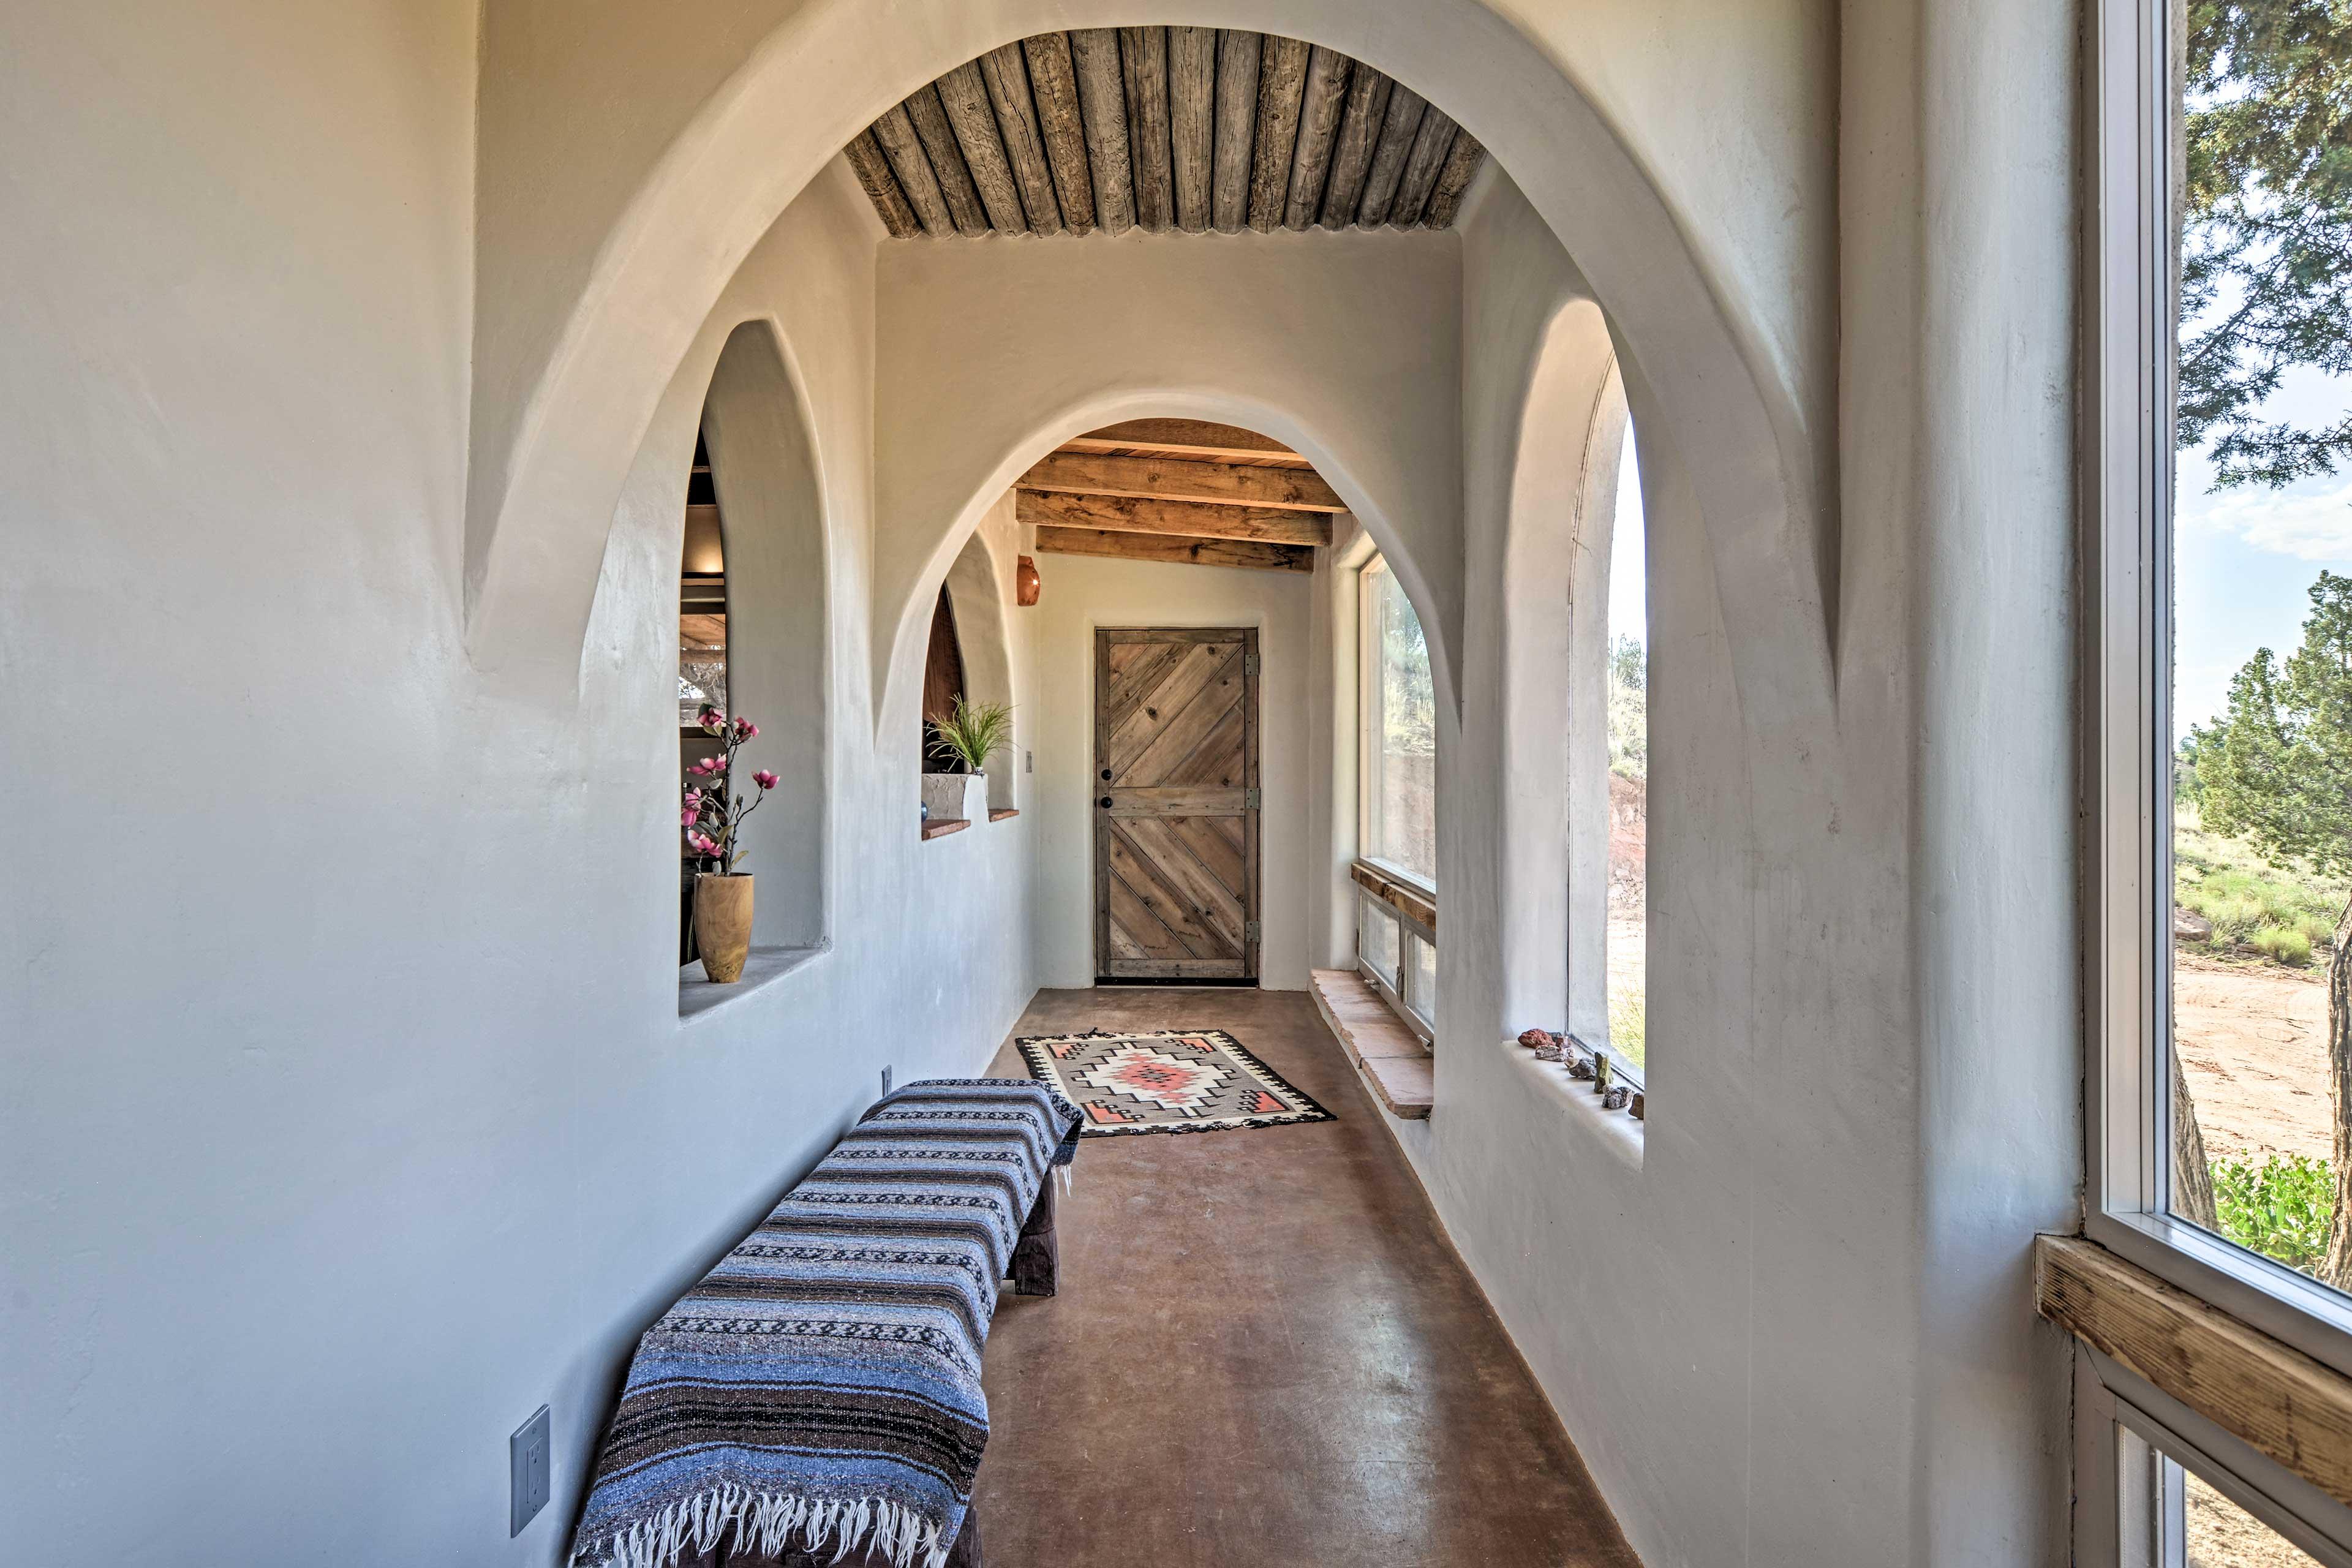 The houses boasts unique architecture & Southwestern decor.